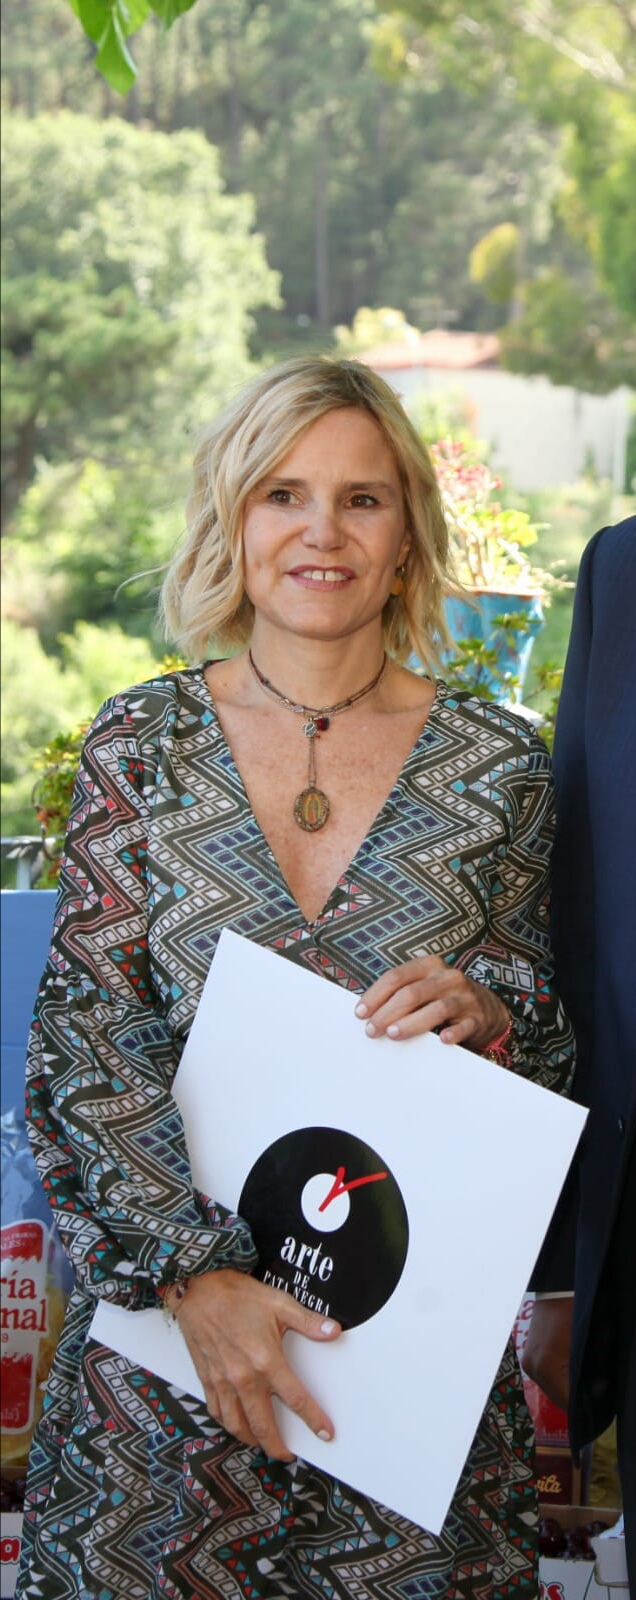 Premios Gredos 2018, Eugenia Martínez de Irujo